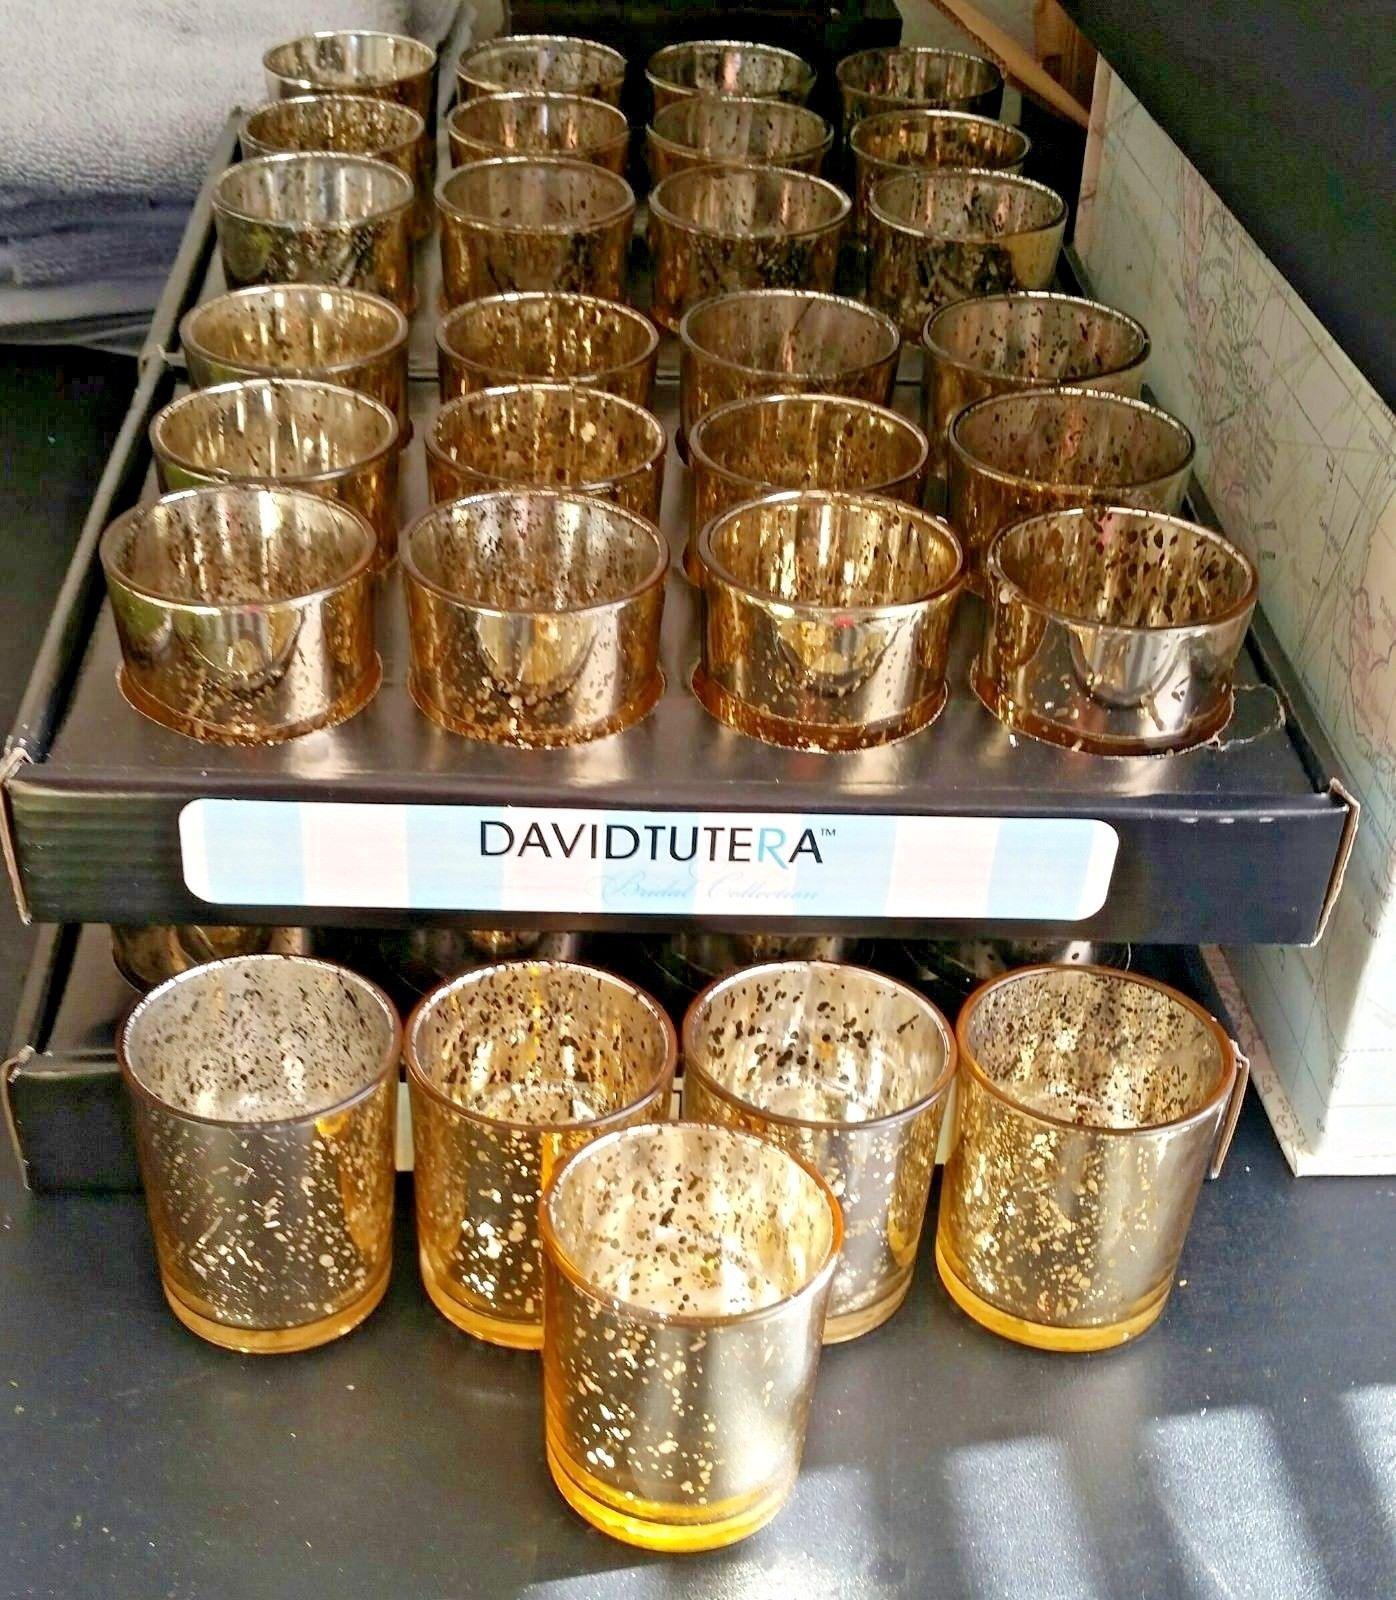 David Tutera Wedding Centerpiece Ideas: Set Of 36 David Tutera Gold Mercury Glass Votive Candle